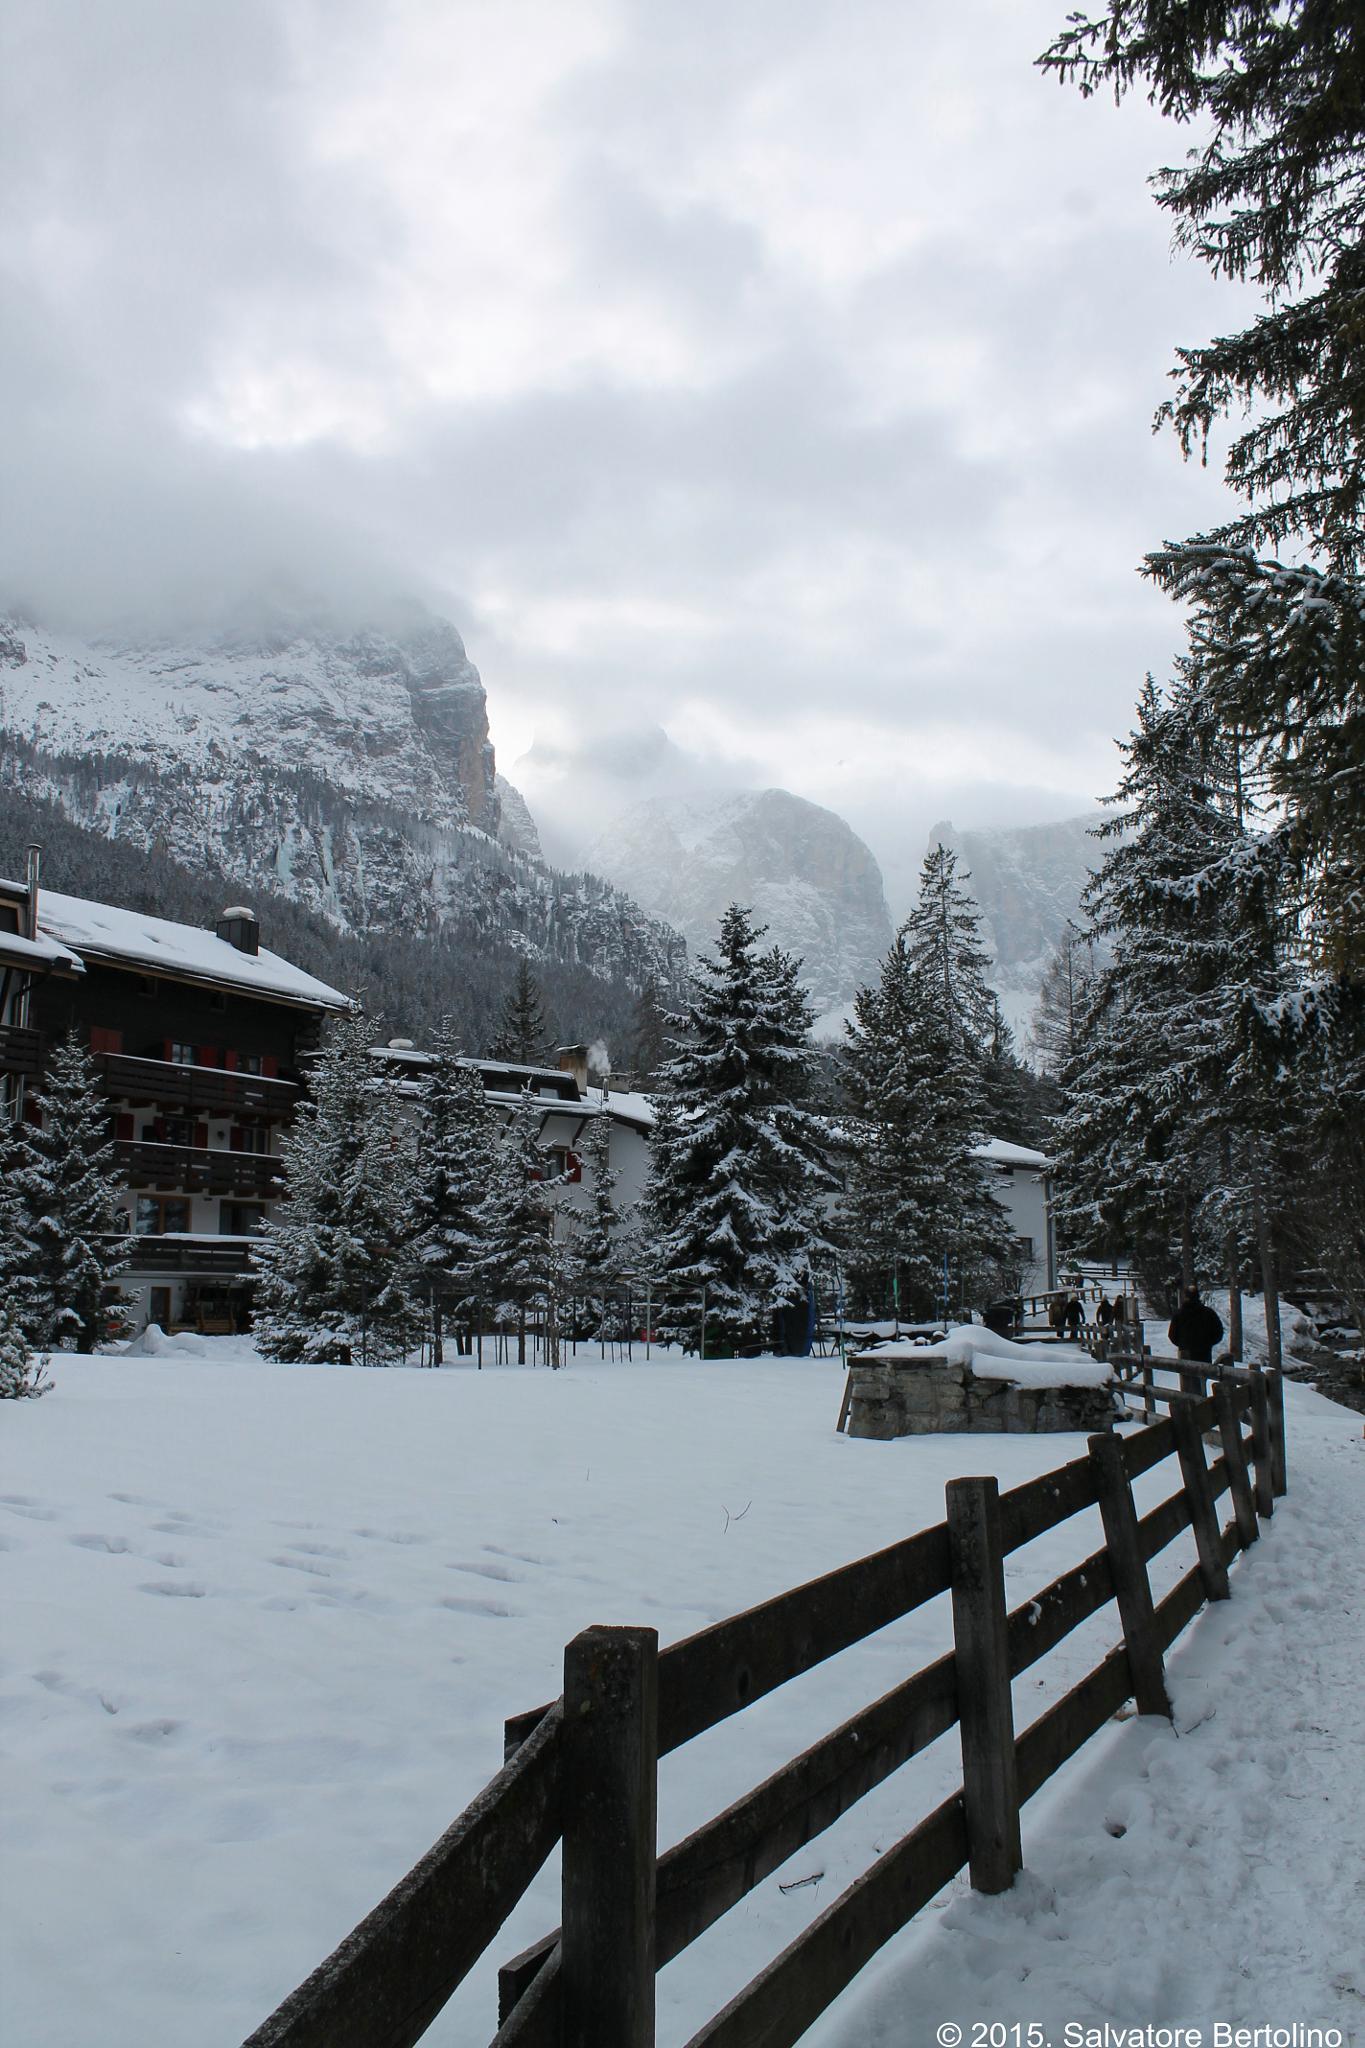 Dolomiti. Nubi sul passo Gardena by Salvatore Bertolino